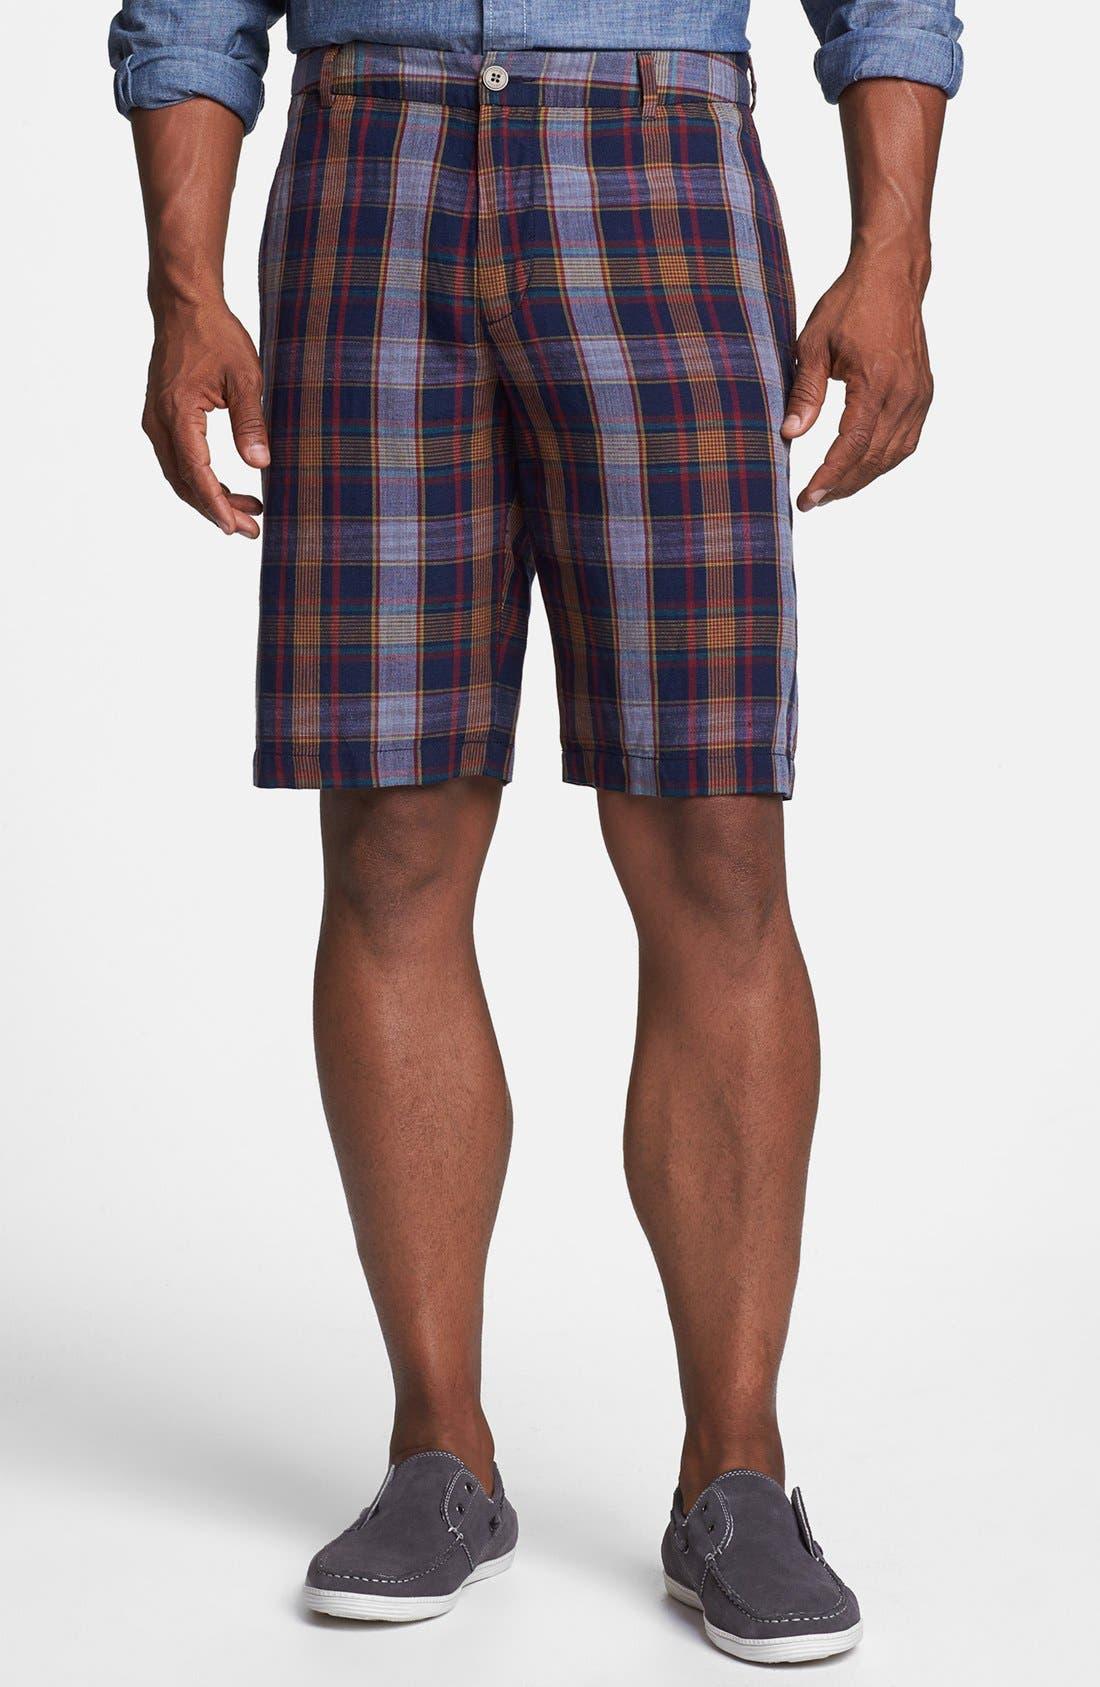 Main Image - Tommy Bahama 'Las Palmas' Plaid Shorts